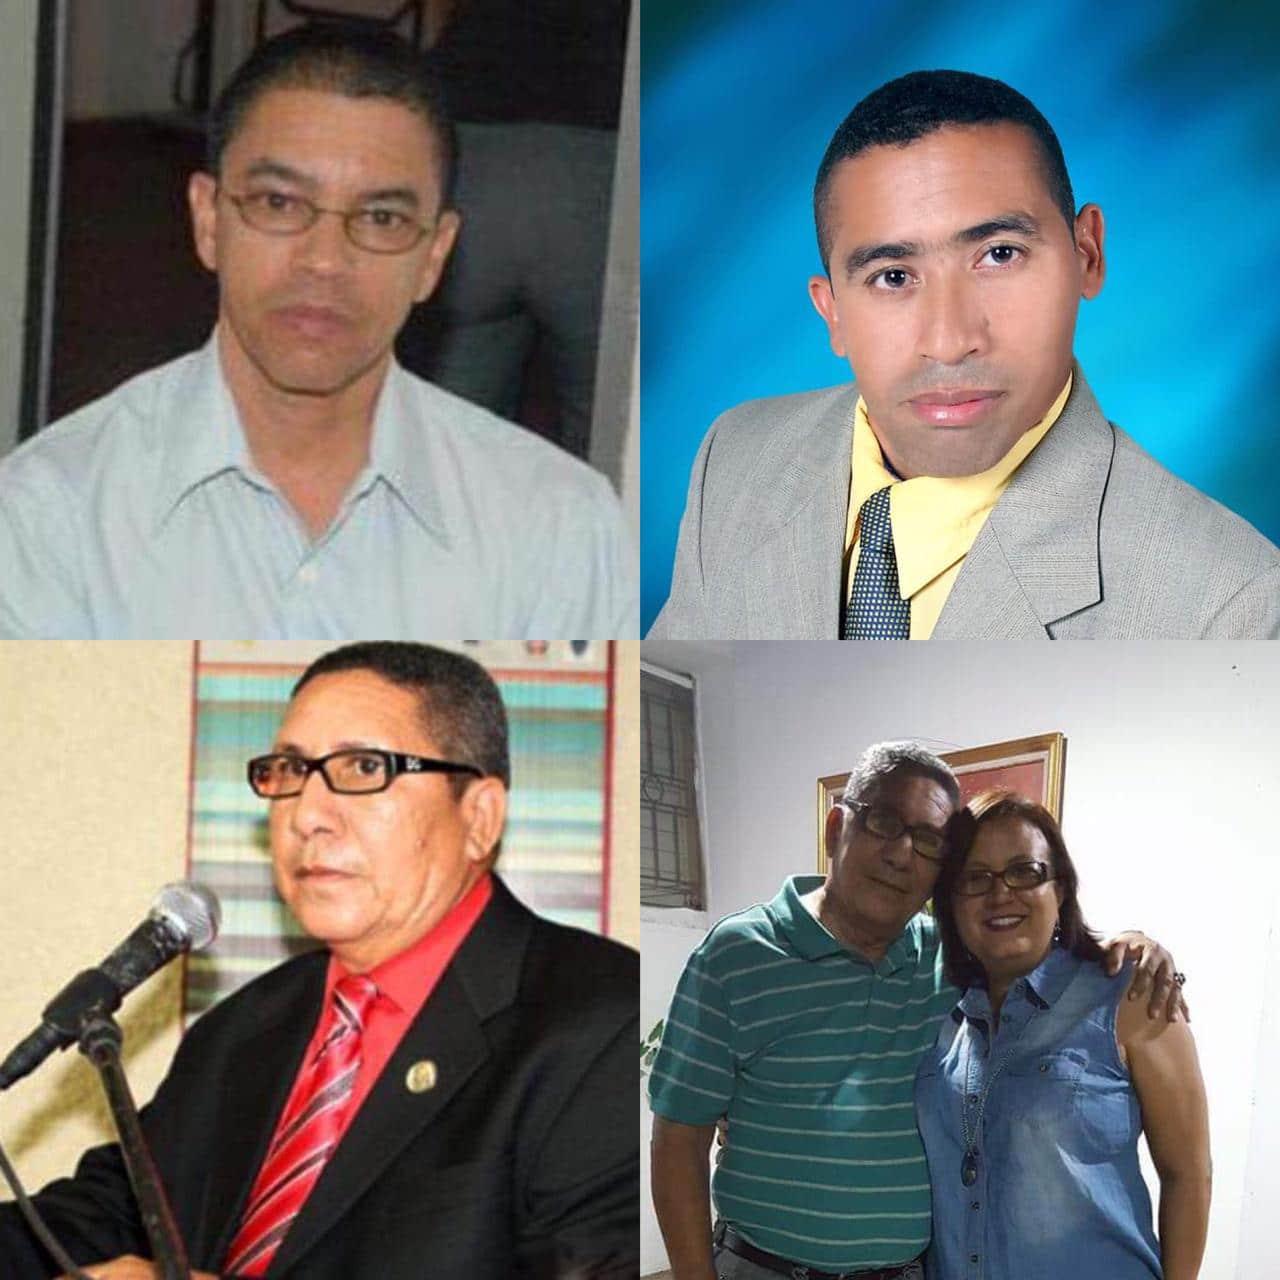 CDP Duarte pide intervención a favor periodistas con sospechas covid-19